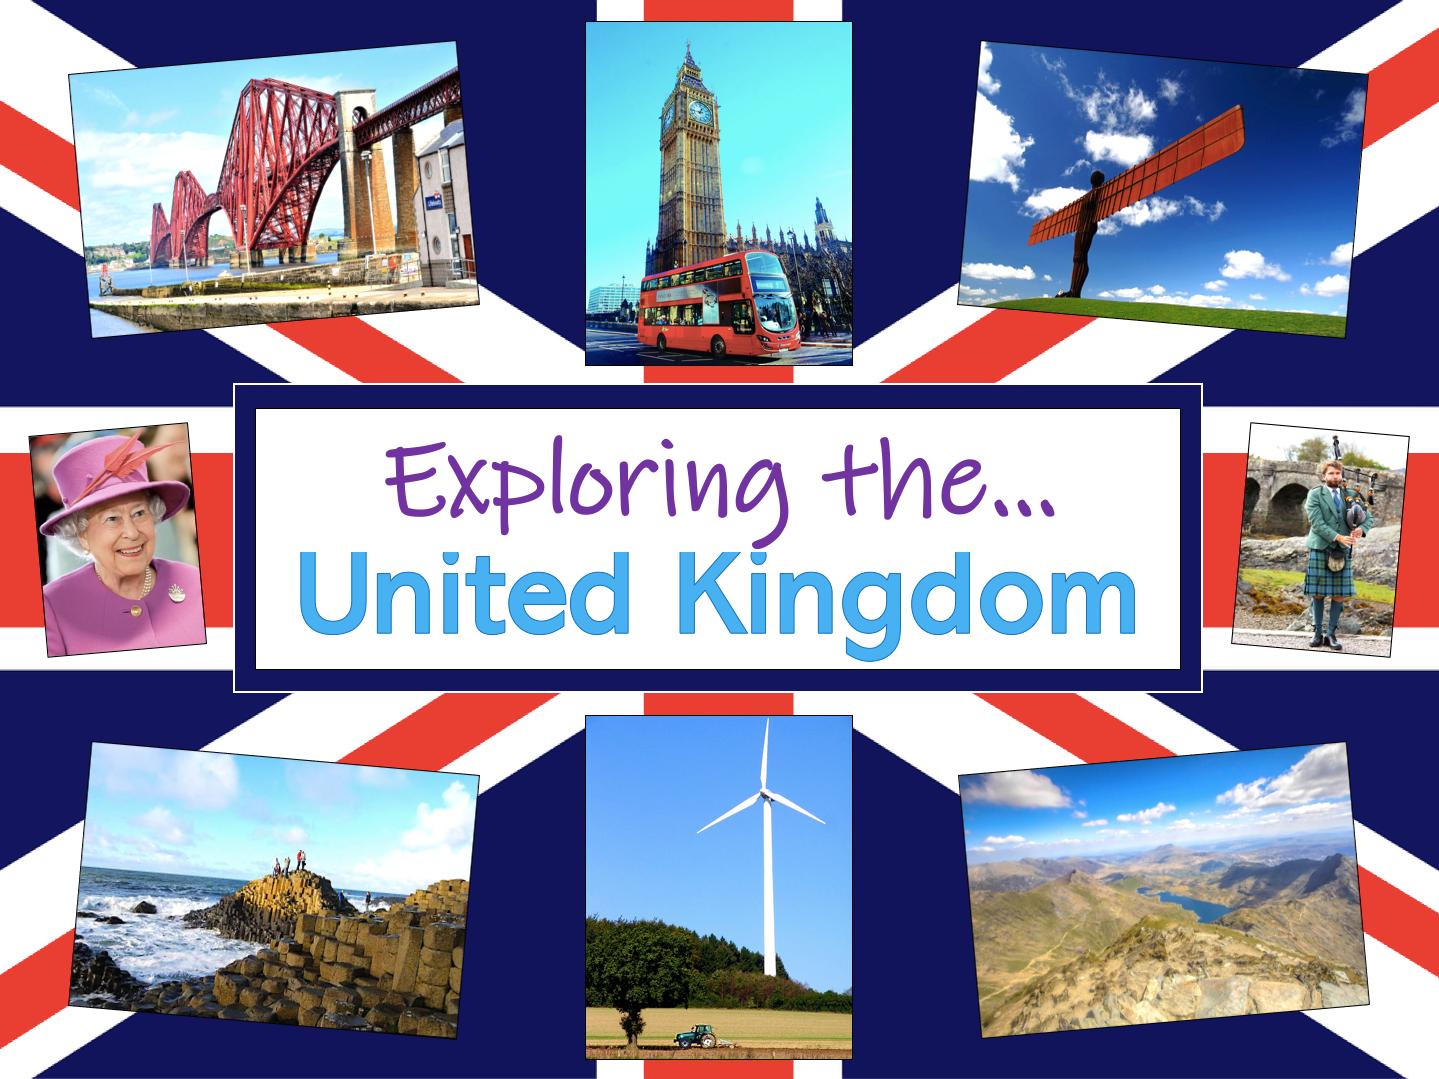 Exploring The United Kingdom